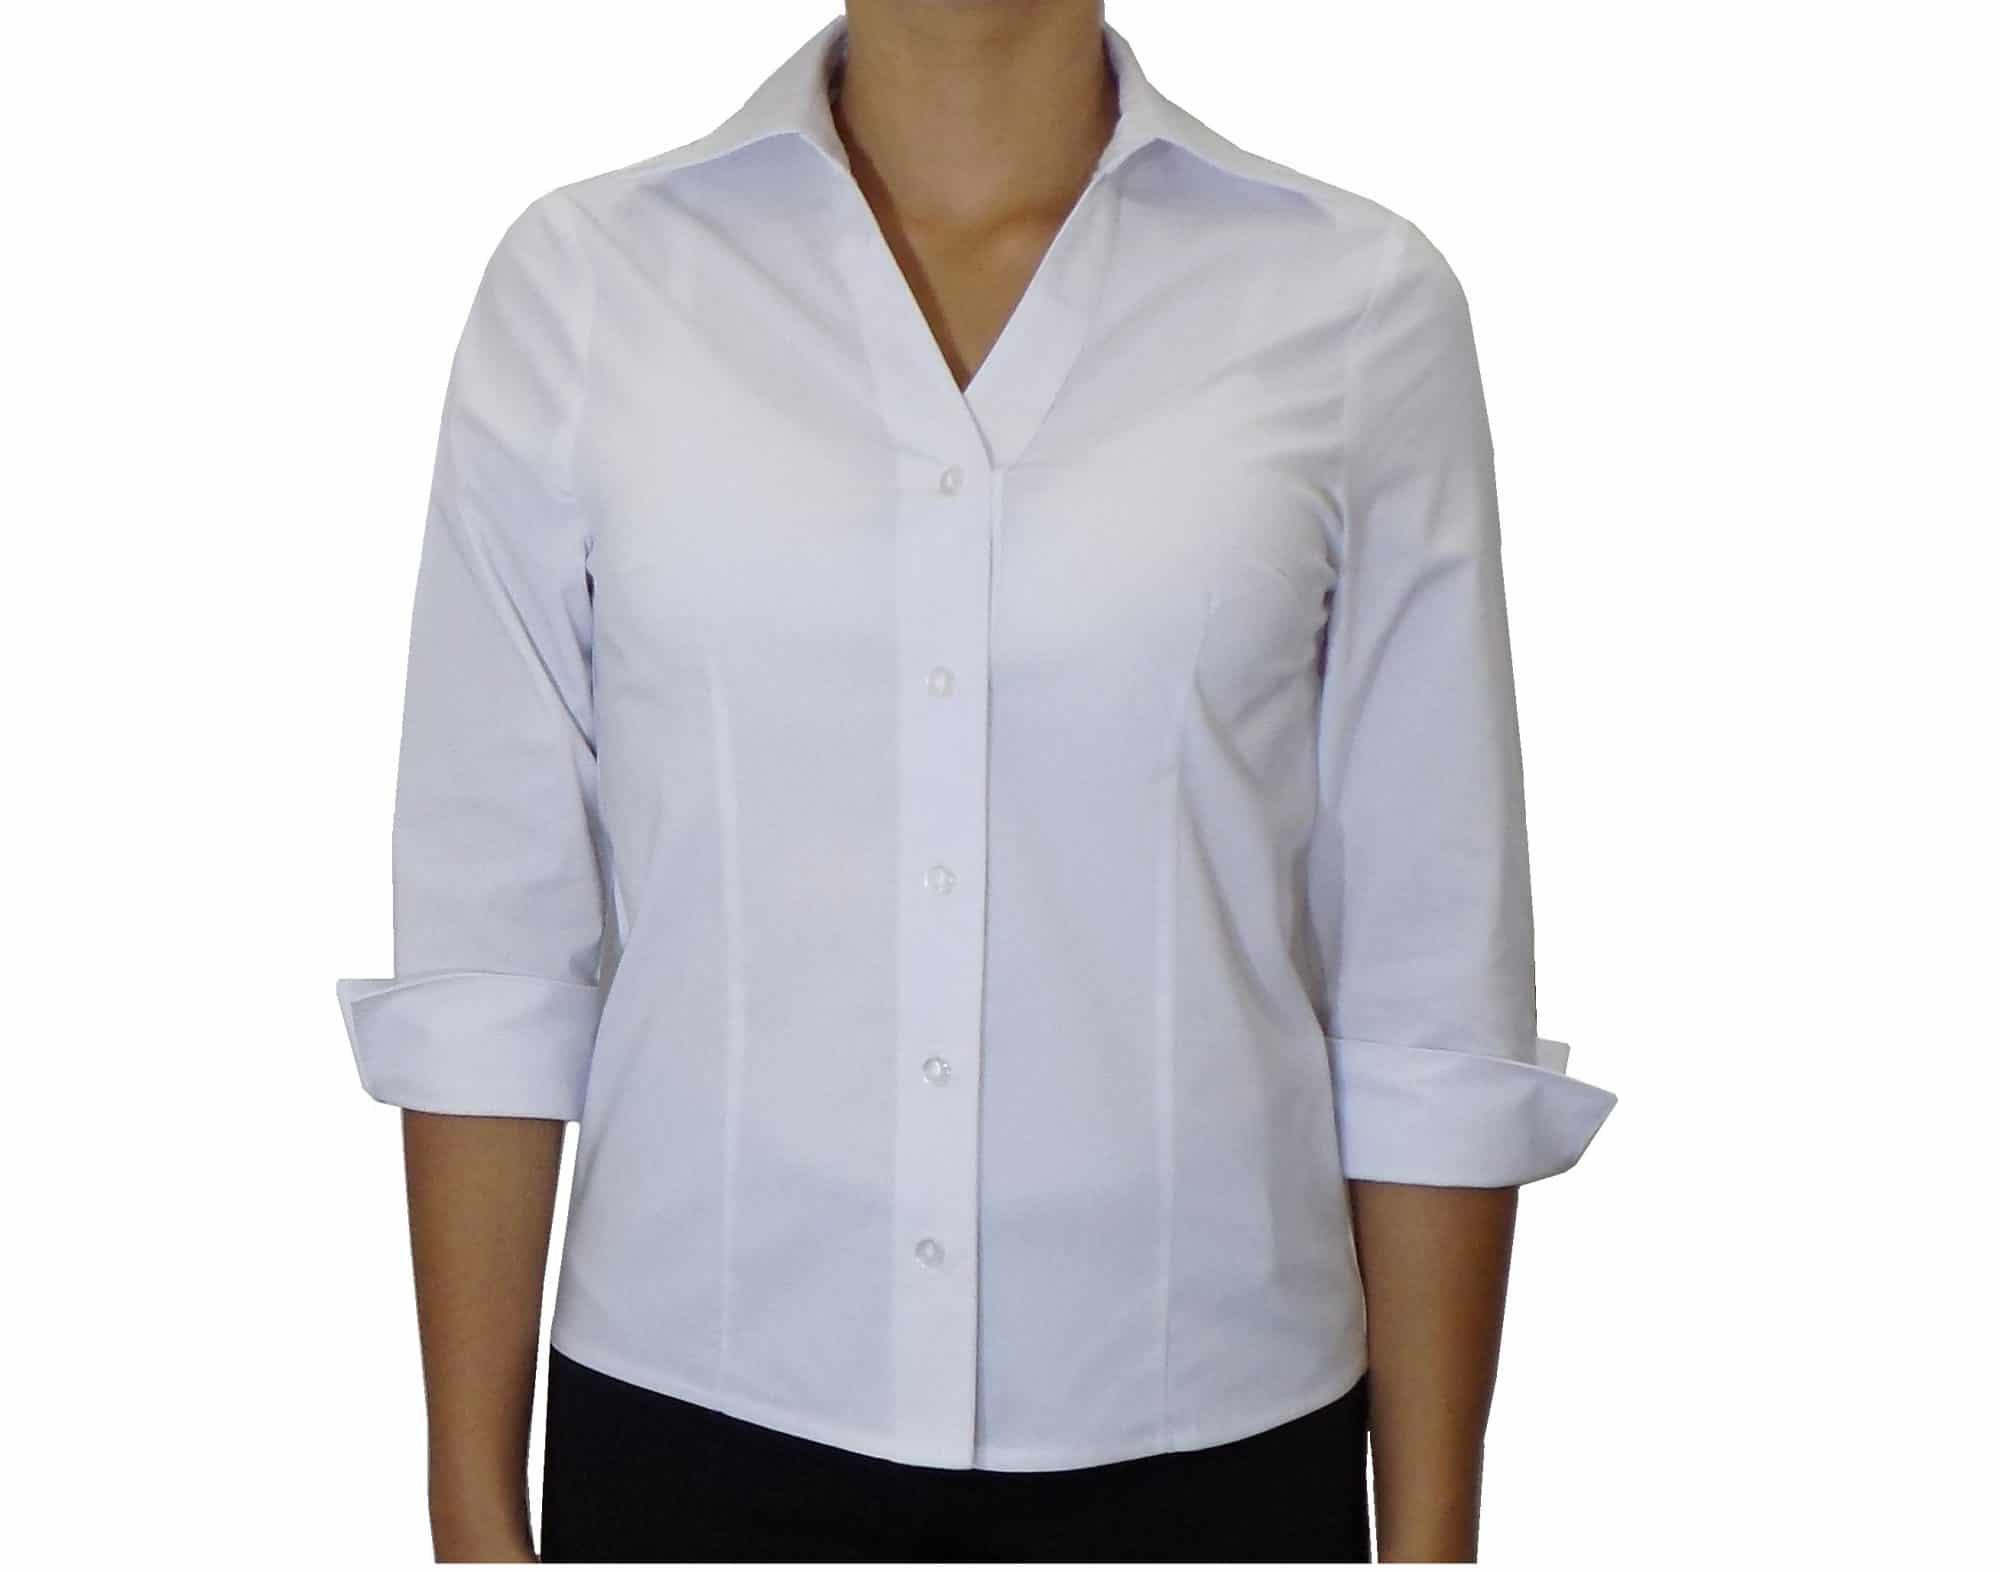 e99e37ba7 Camisa Social Feminina Botões Decote V manga 3 4Majoleh Uniformes ...